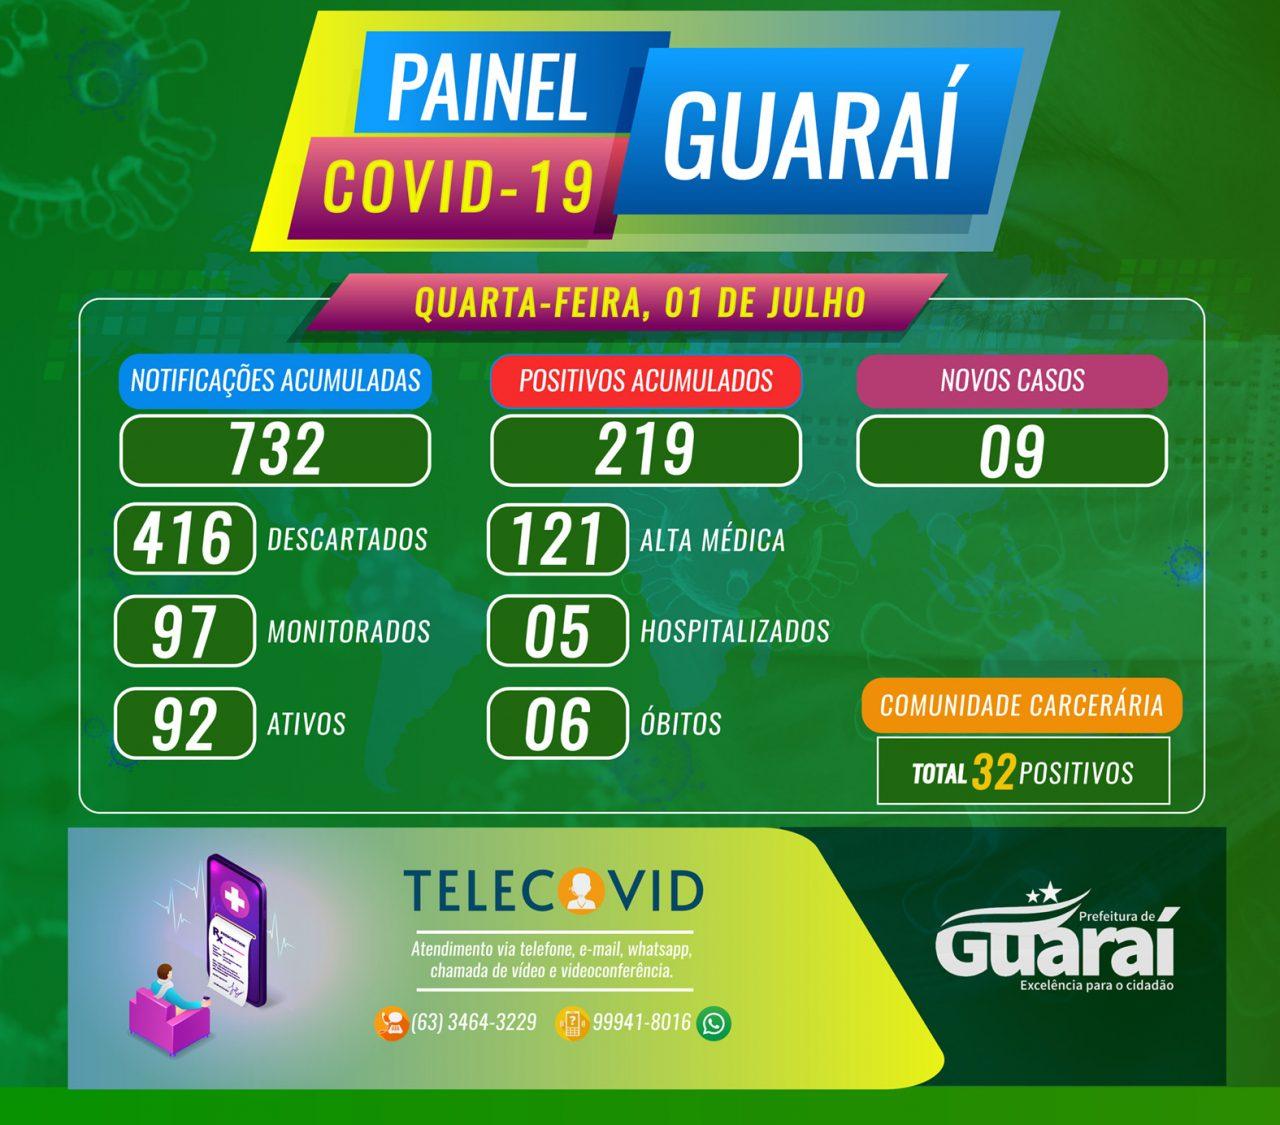 PAINEL GUARAI COVID19 1 DE JULHO QUARTA 1280x1125 - Painel Guaraí-TO / Covid-19 / Boletim 01 de Julho (quarta) 16:00